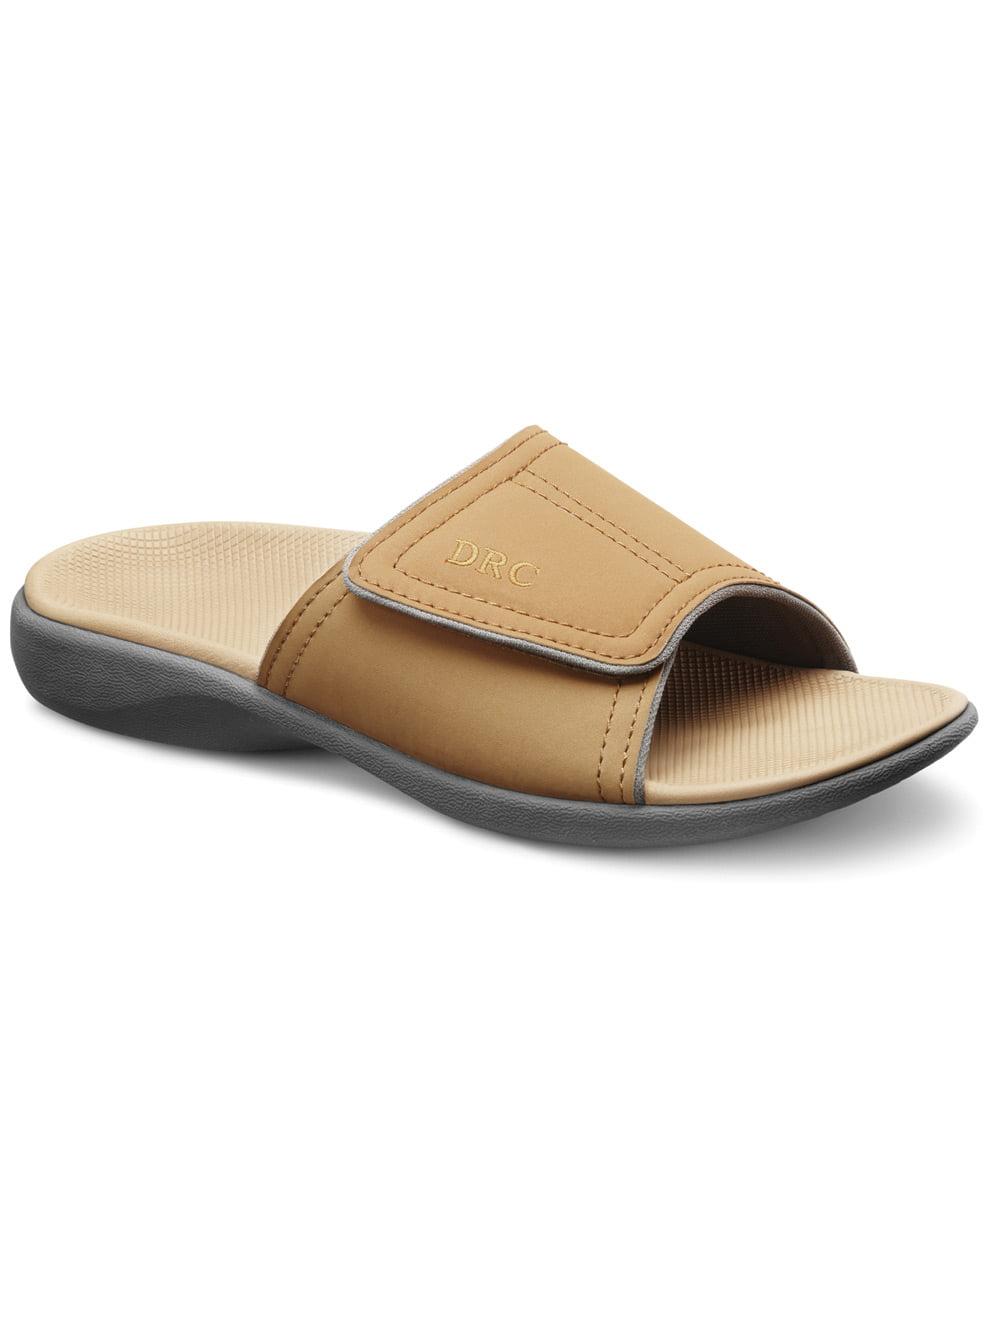 Dr. Comfort Kelly Women's Orthopedic Sandals